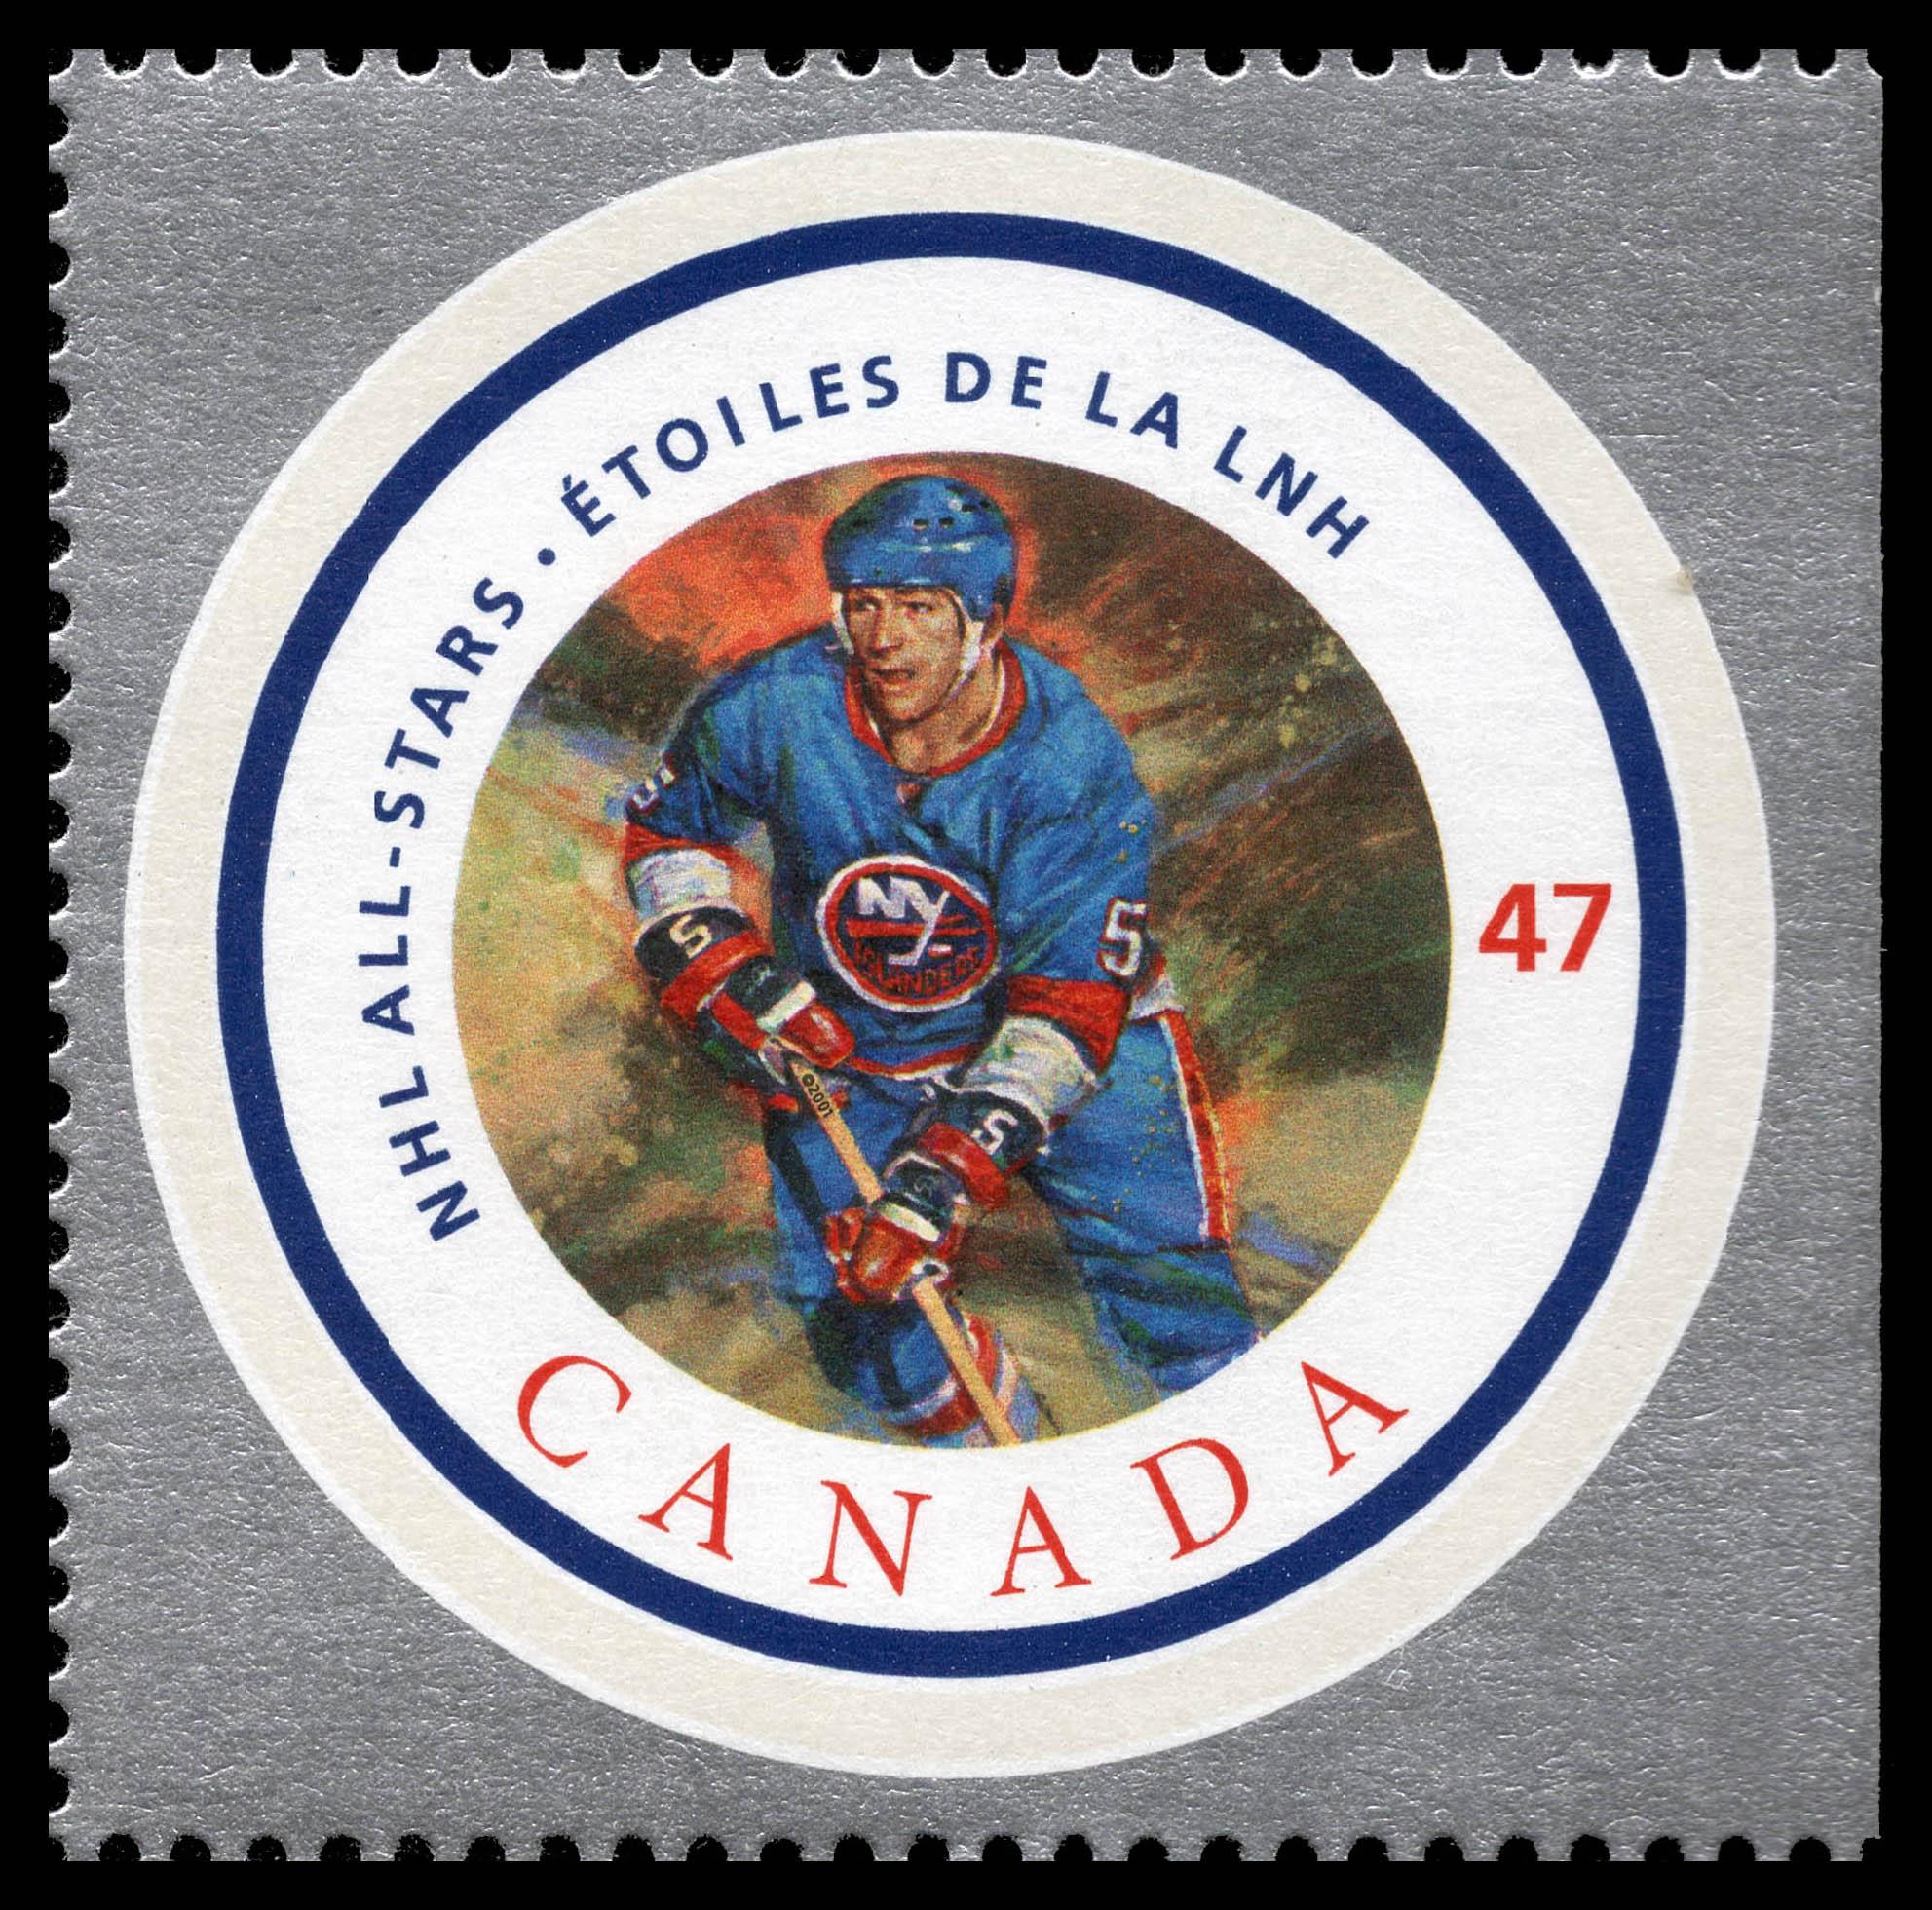 Denis Potvin Canada Postage Stamp   NHL All-Stars